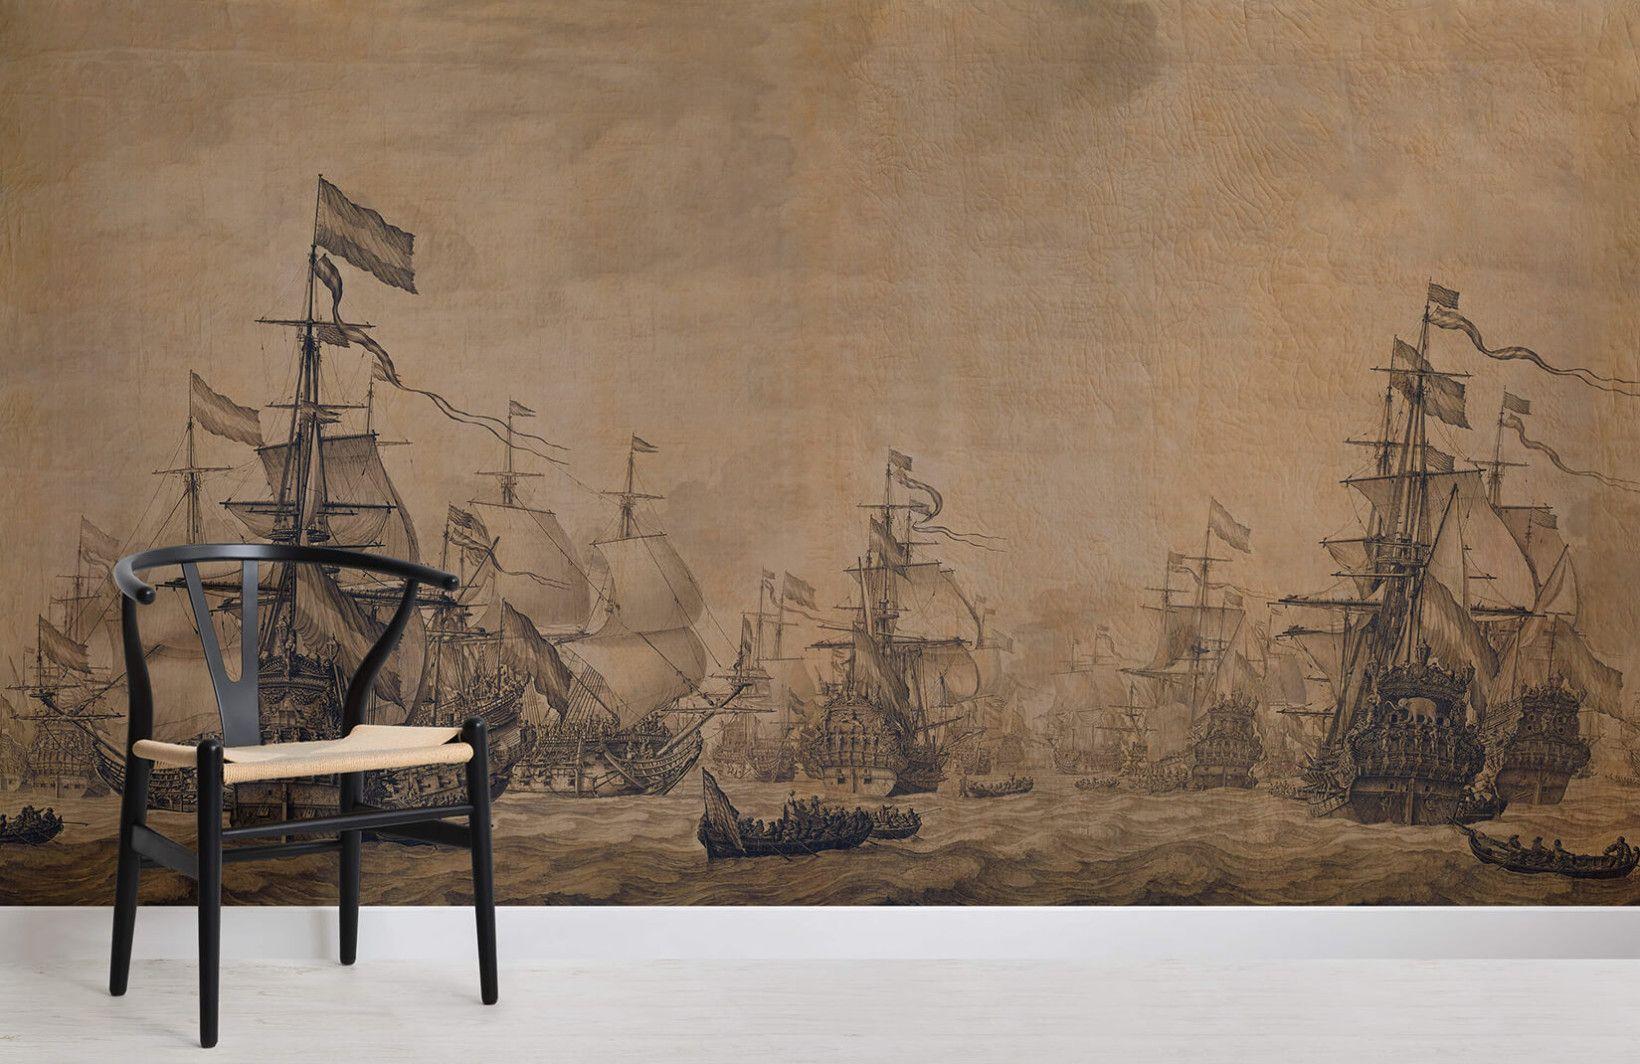 dutch flagships at sea van de velde art room painting wallpaper mural painting